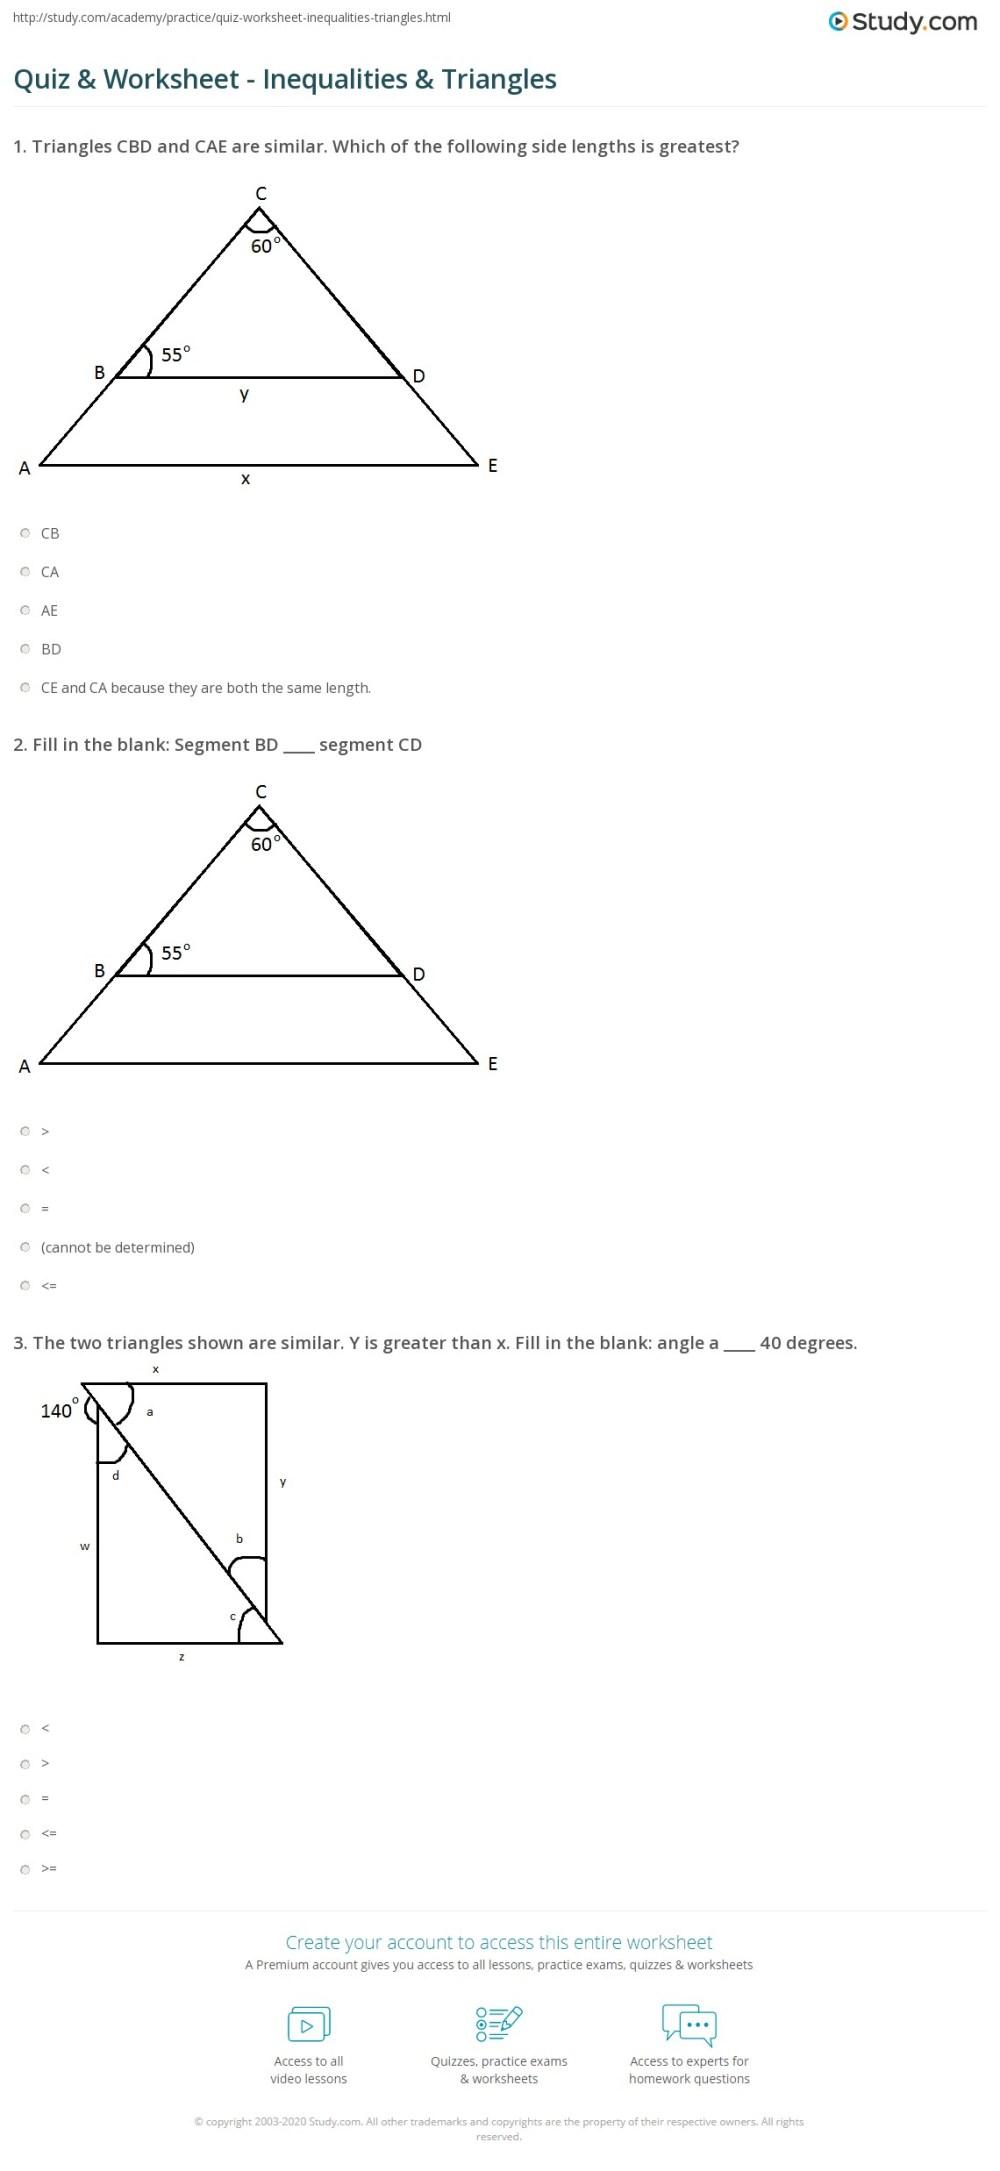 medium resolution of Quiz \u0026 Worksheet - Inequalities \u0026 Triangles   Study.com